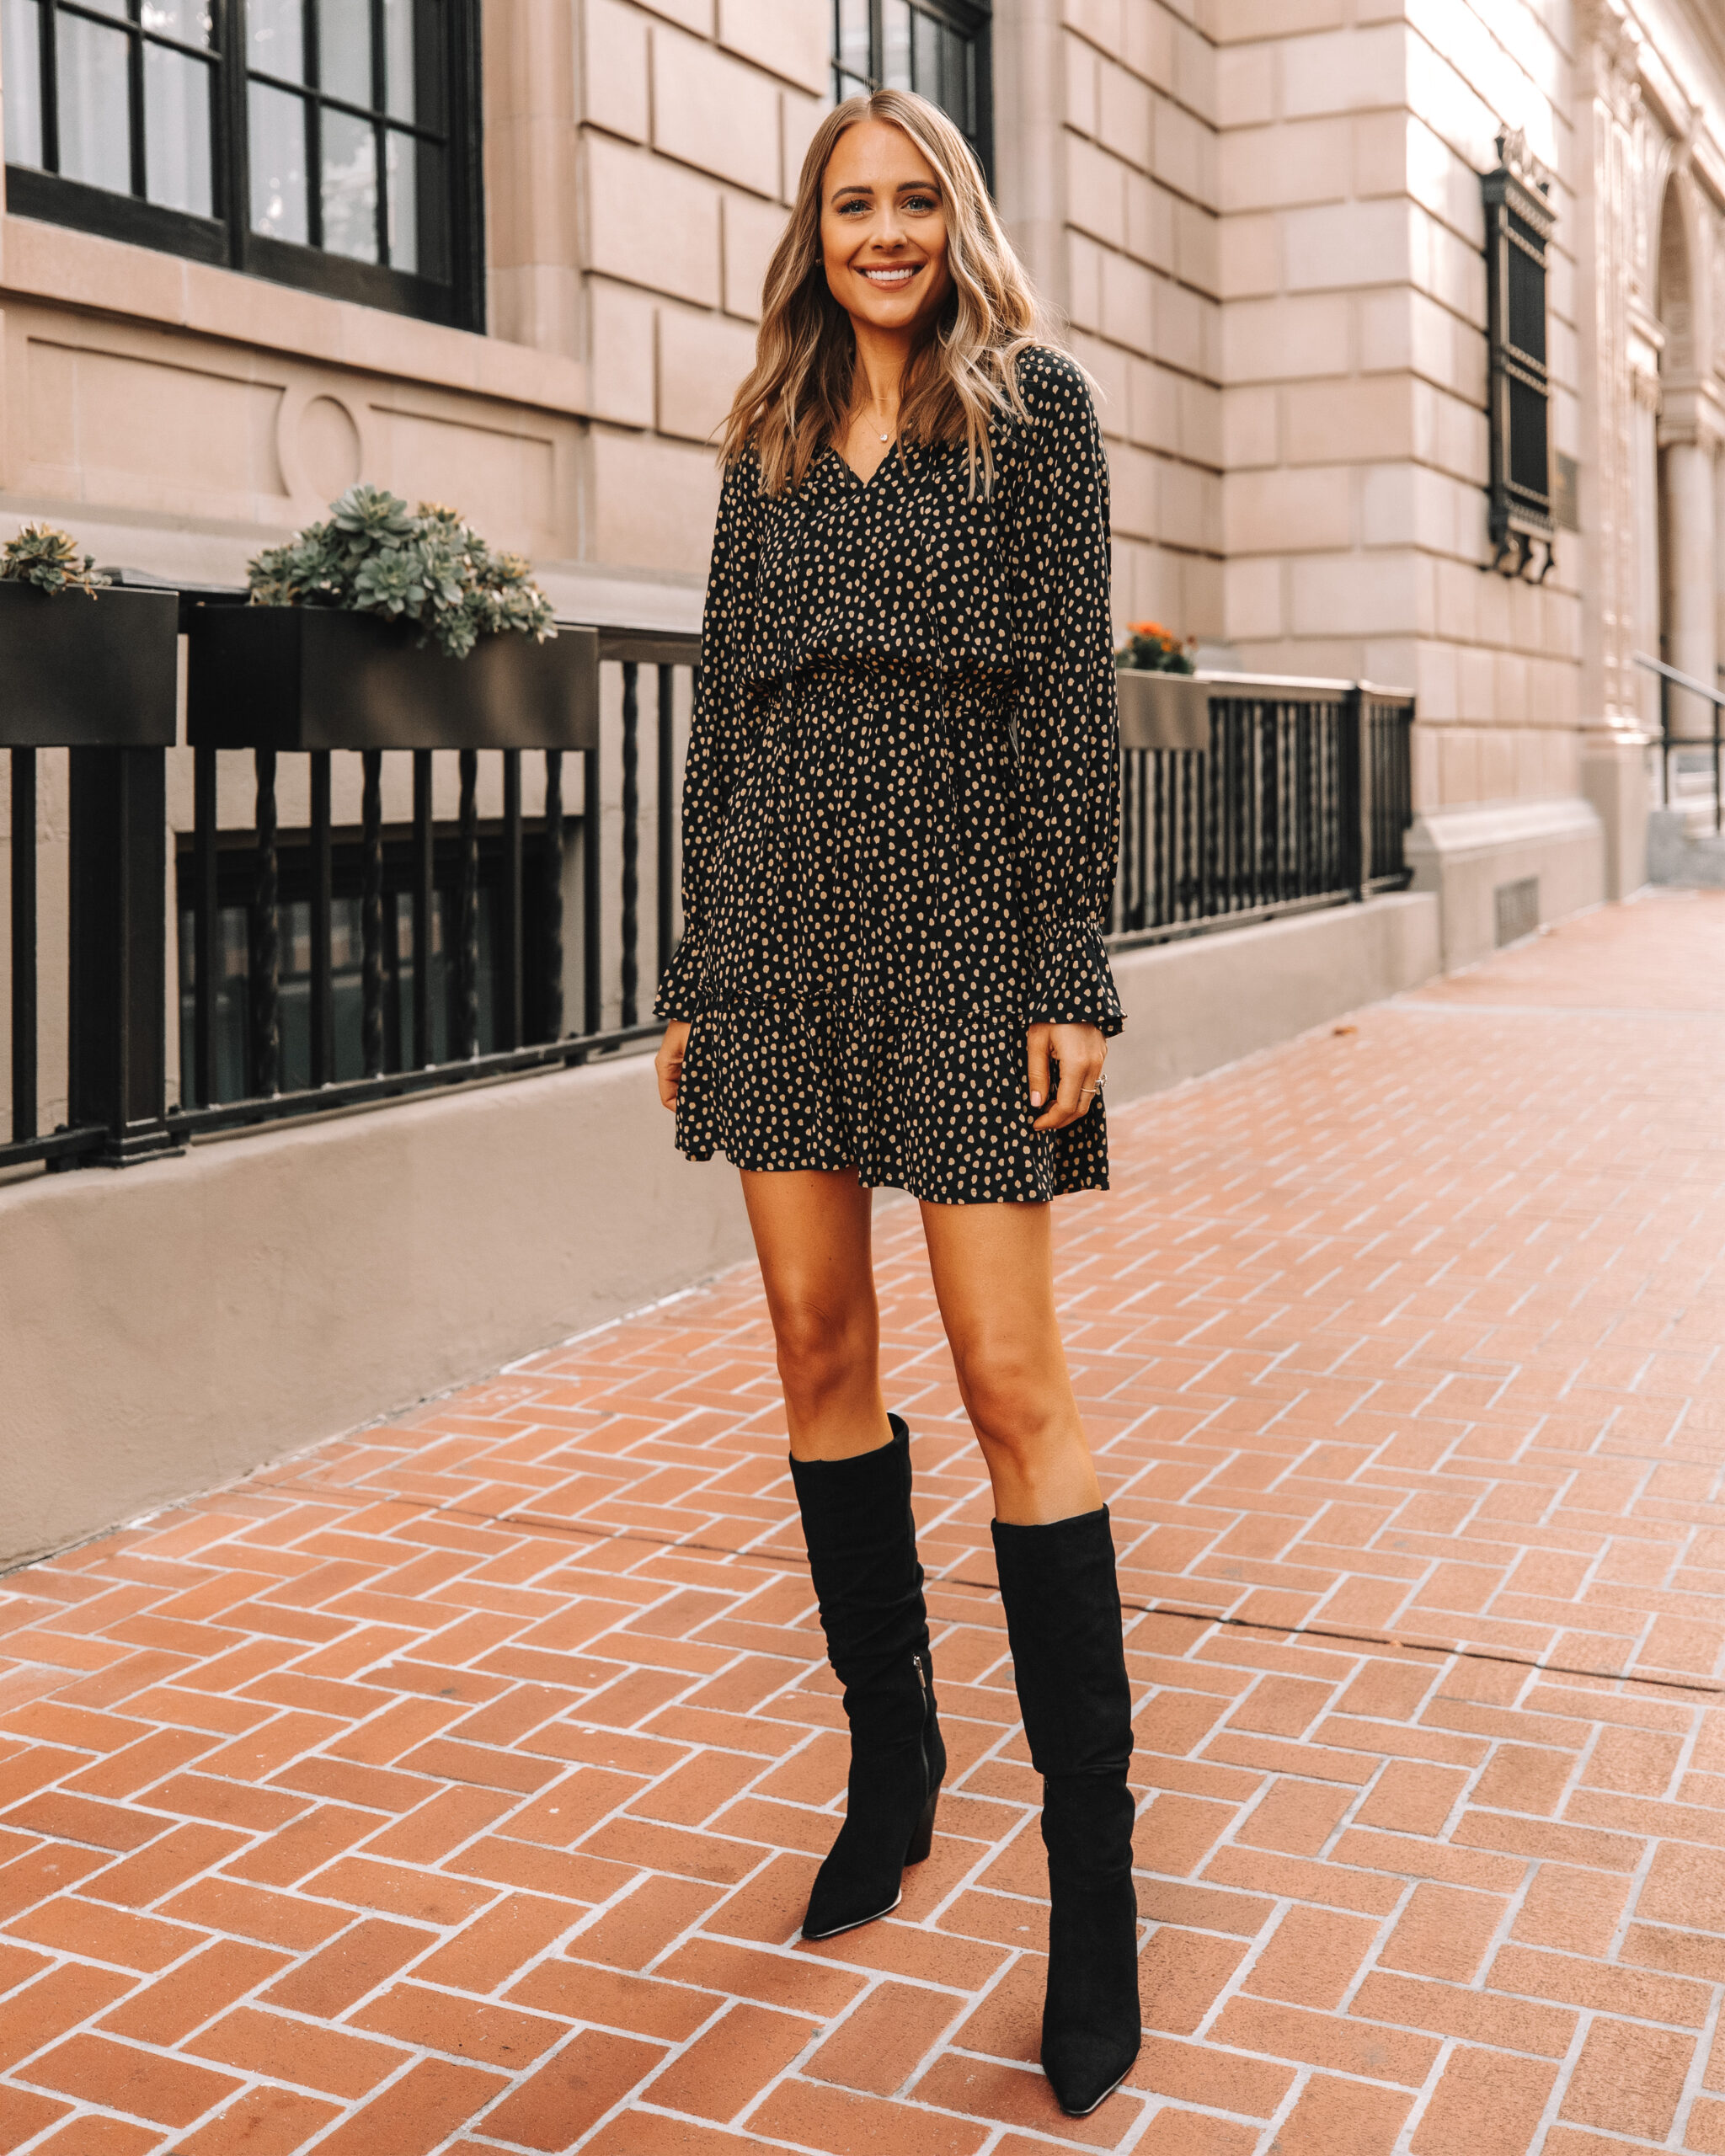 Fashion Jackson Wearing Amazon The Drop Polka Dot Mini Dress Black Knee High Boots